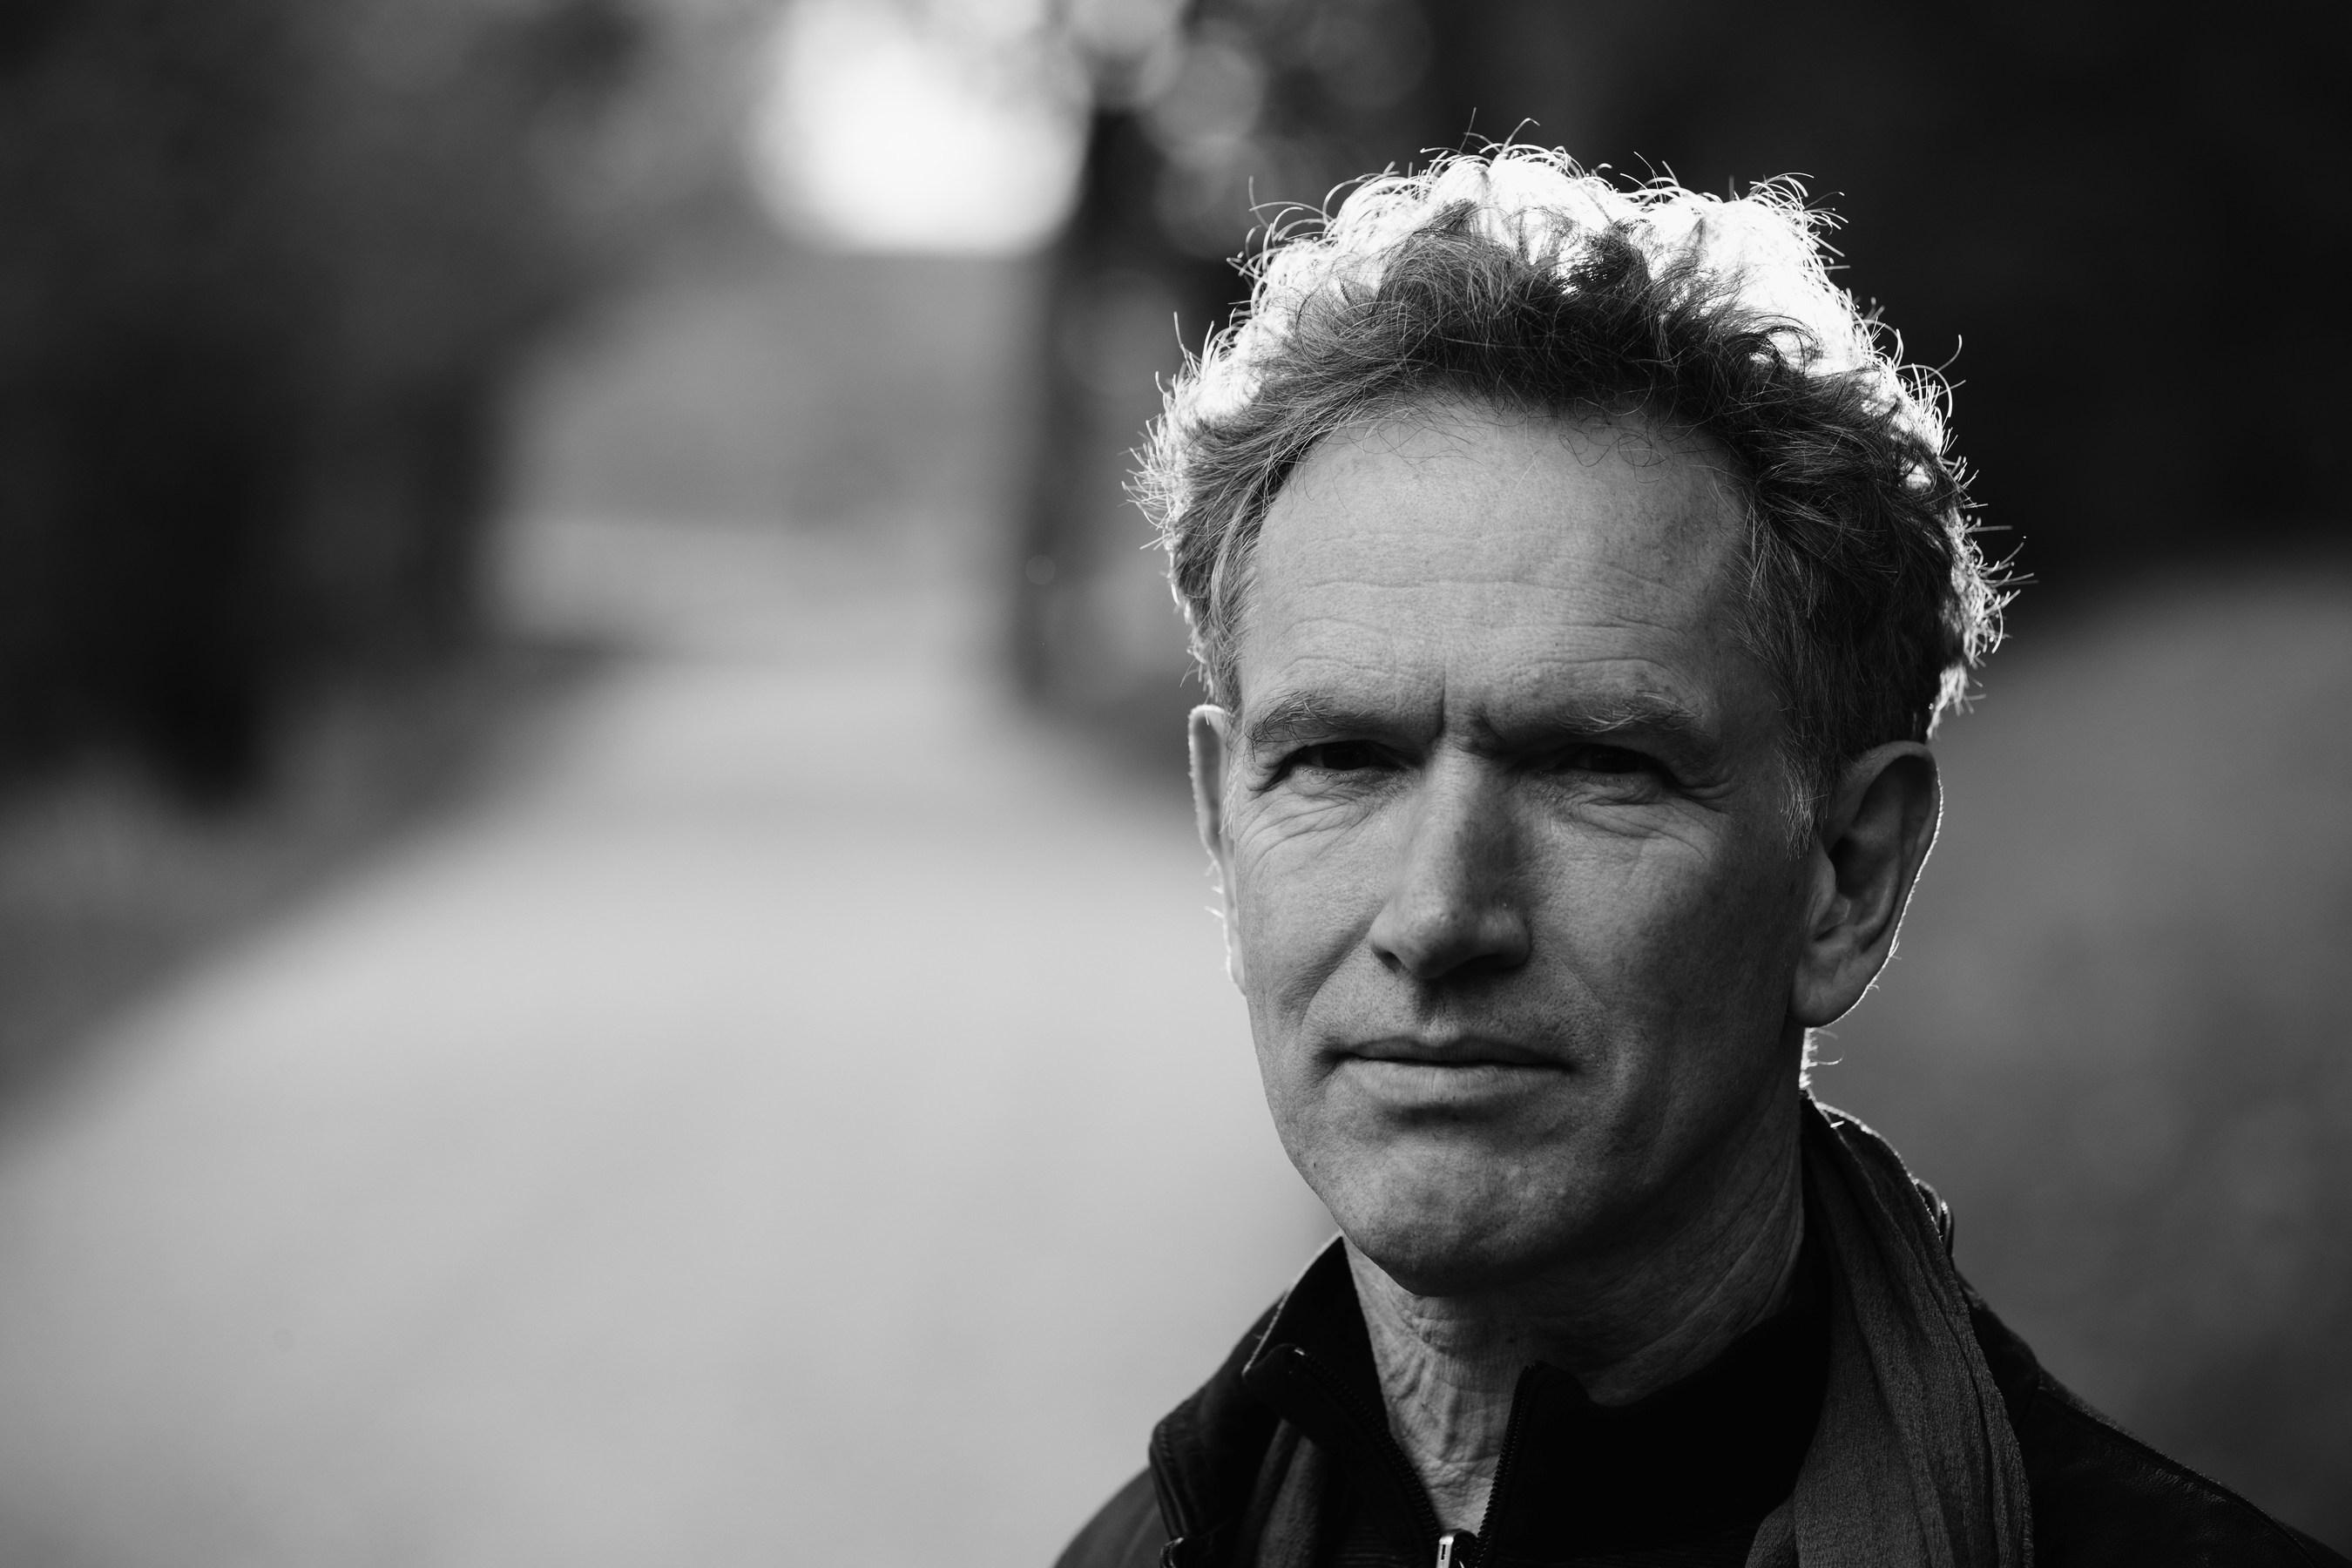 Hans Abrahamsen vinder Grawemeyer-prisen for musikkompositioner